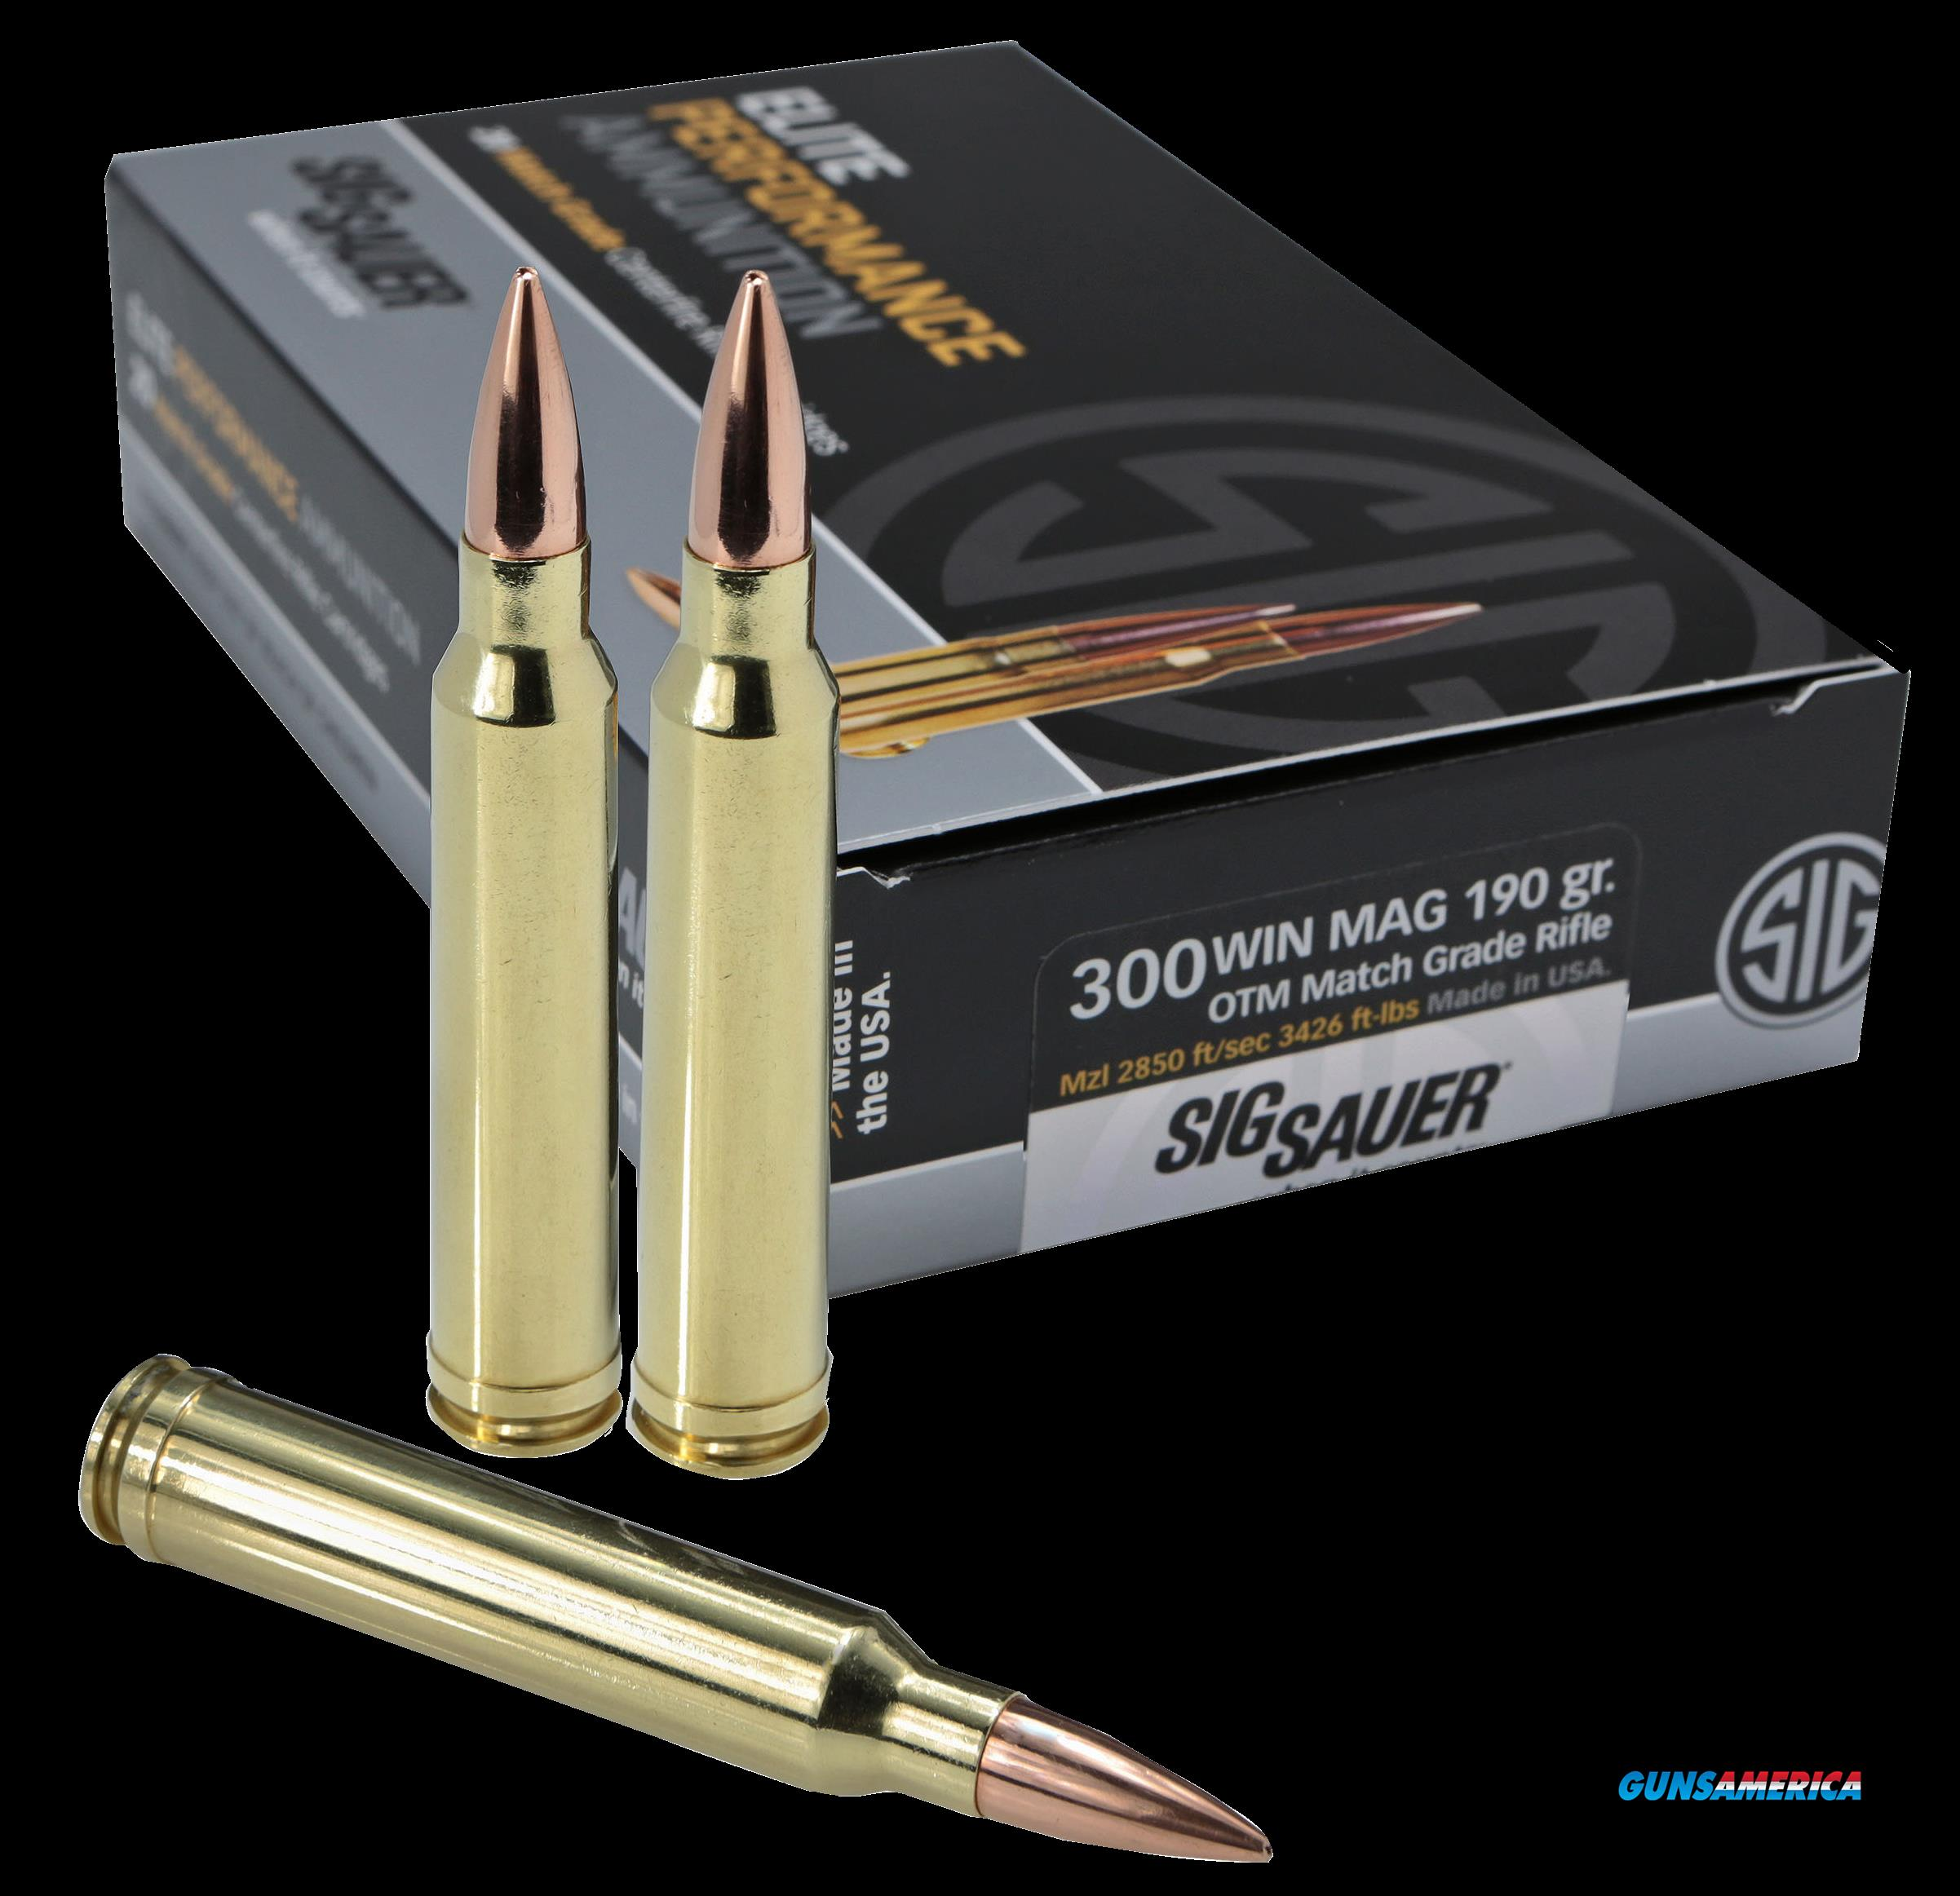 Sig Sauer Elite Match Grade, Sig E3wmm1-20    300mg    190 Otm Mtch  20-10  Guns > Pistols > 1911 Pistol Copies (non-Colt)